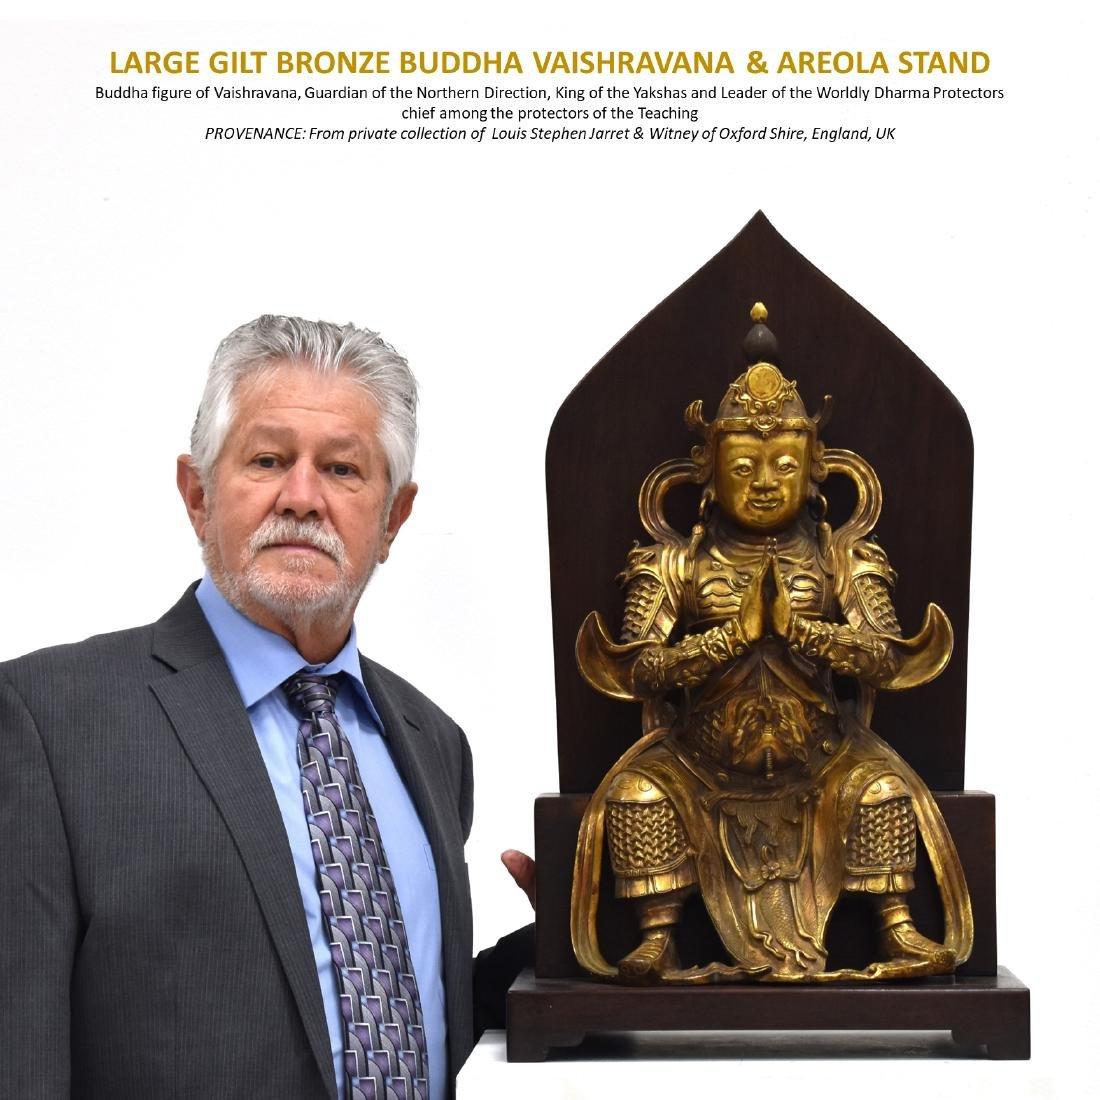 LARGE GILT BRONZE BUDDHA VAISHRAVANA & AREOLA STAND